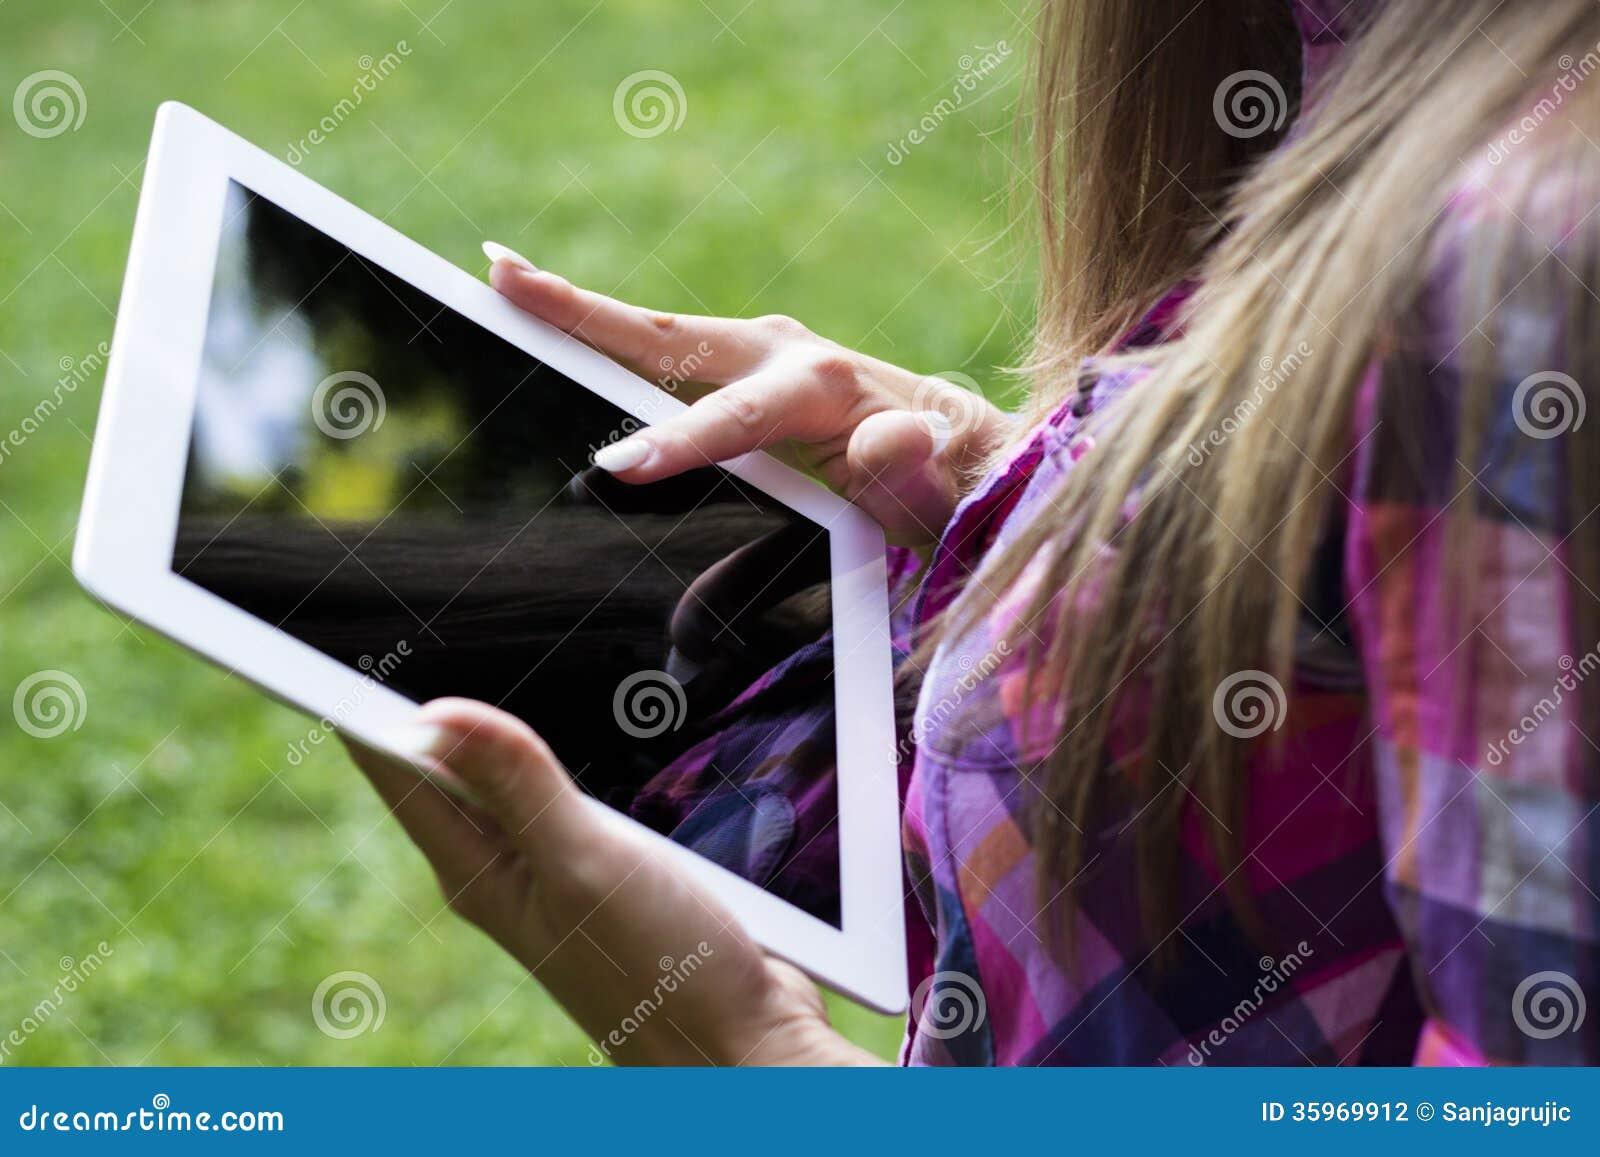 Manos femeninas usando una tableta digital